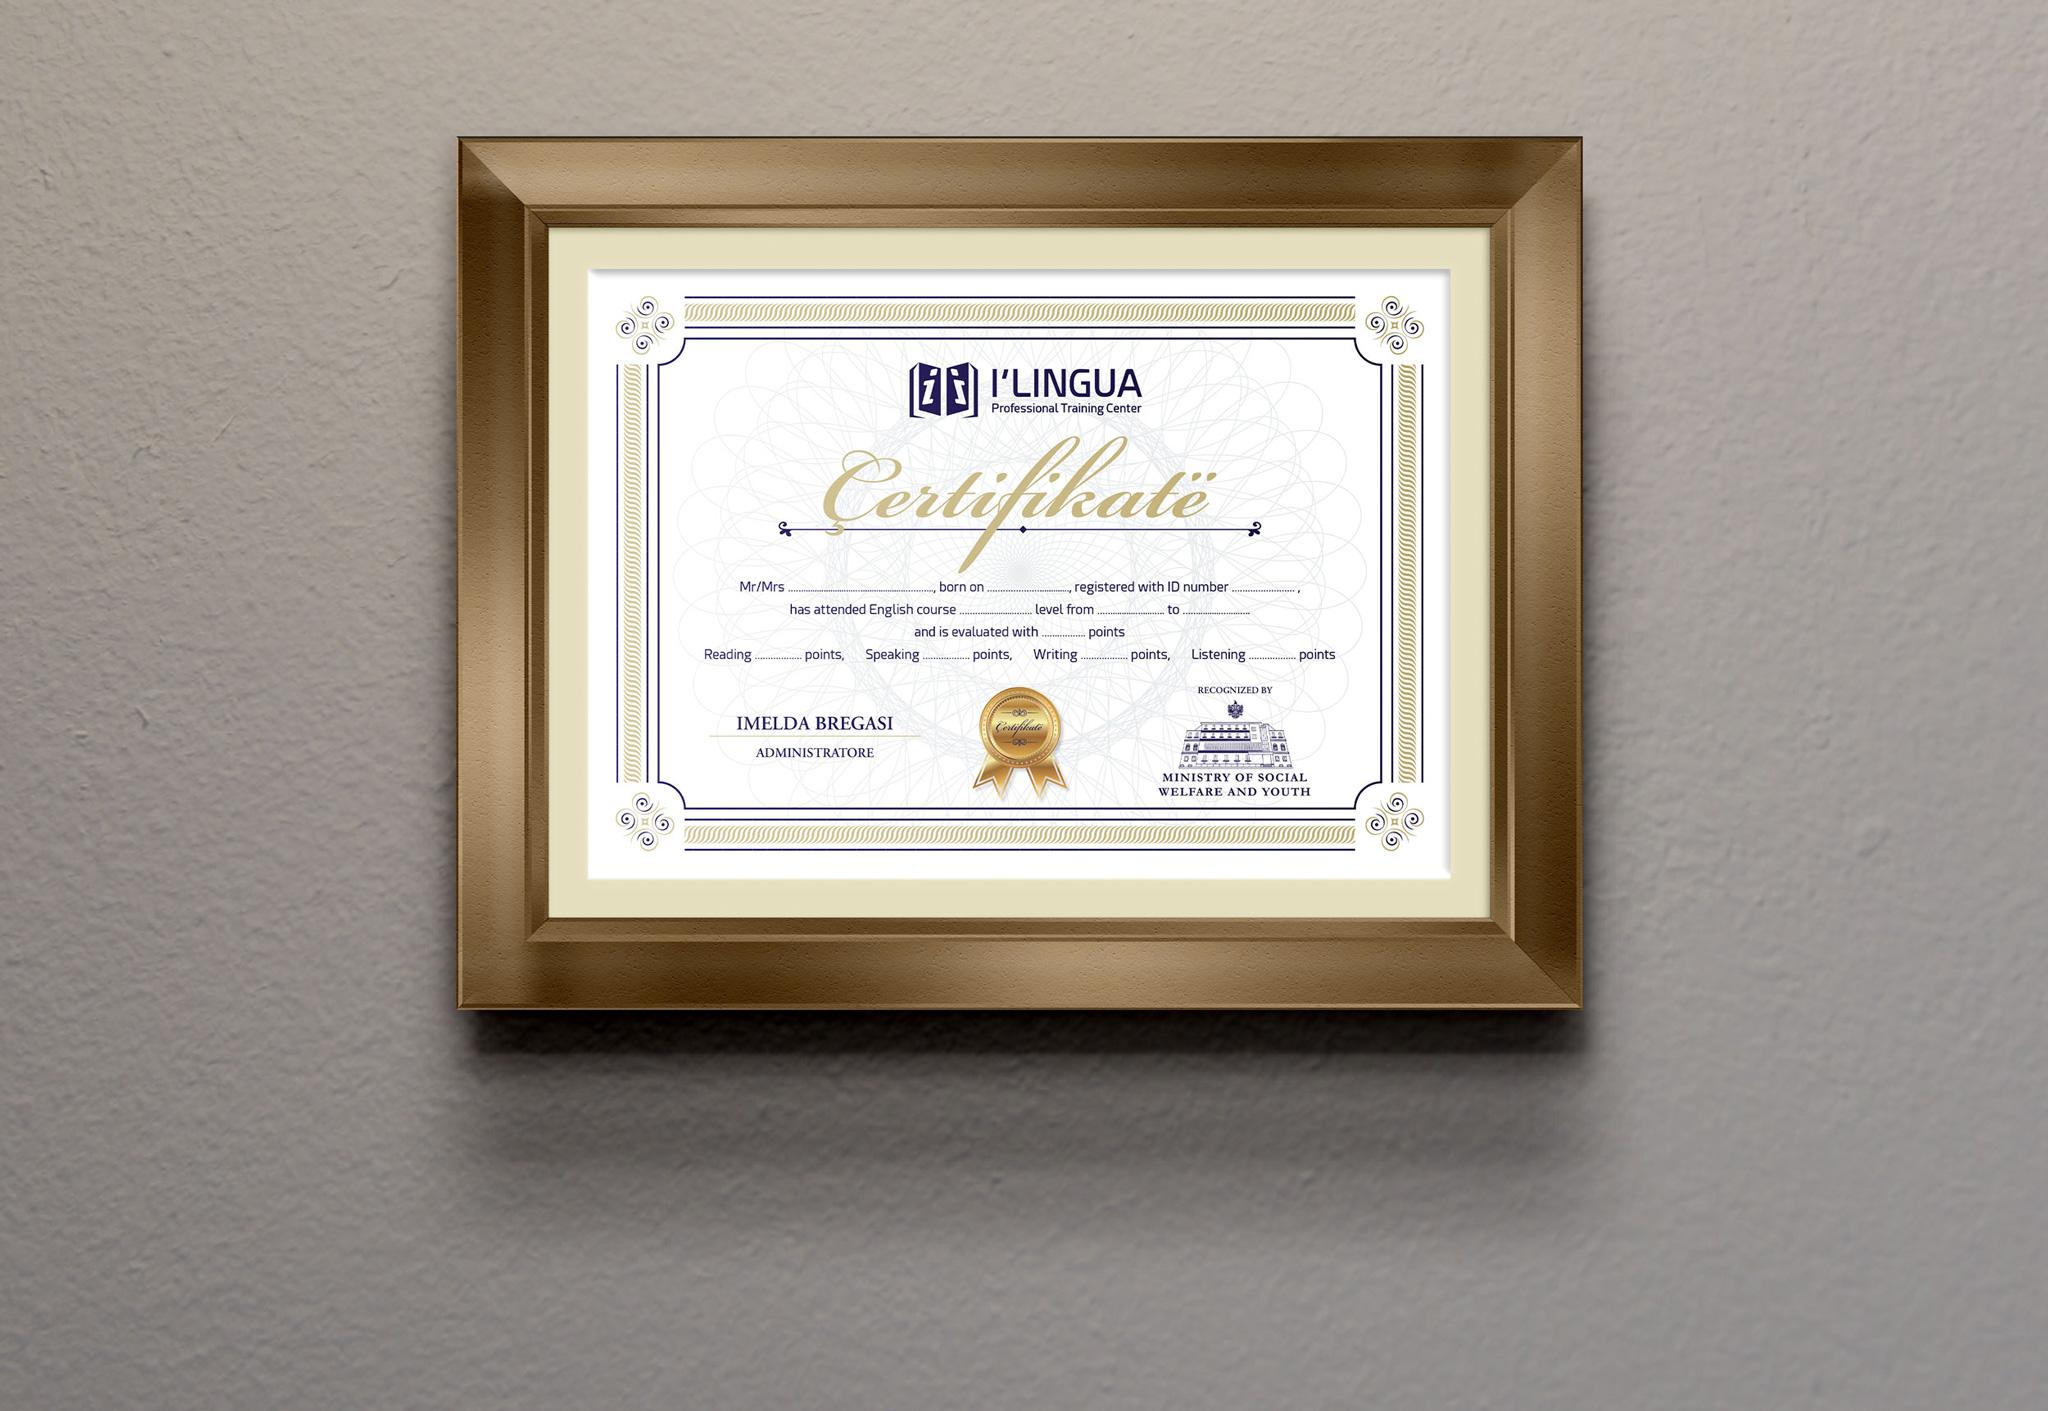 Çertifikata & Diploma